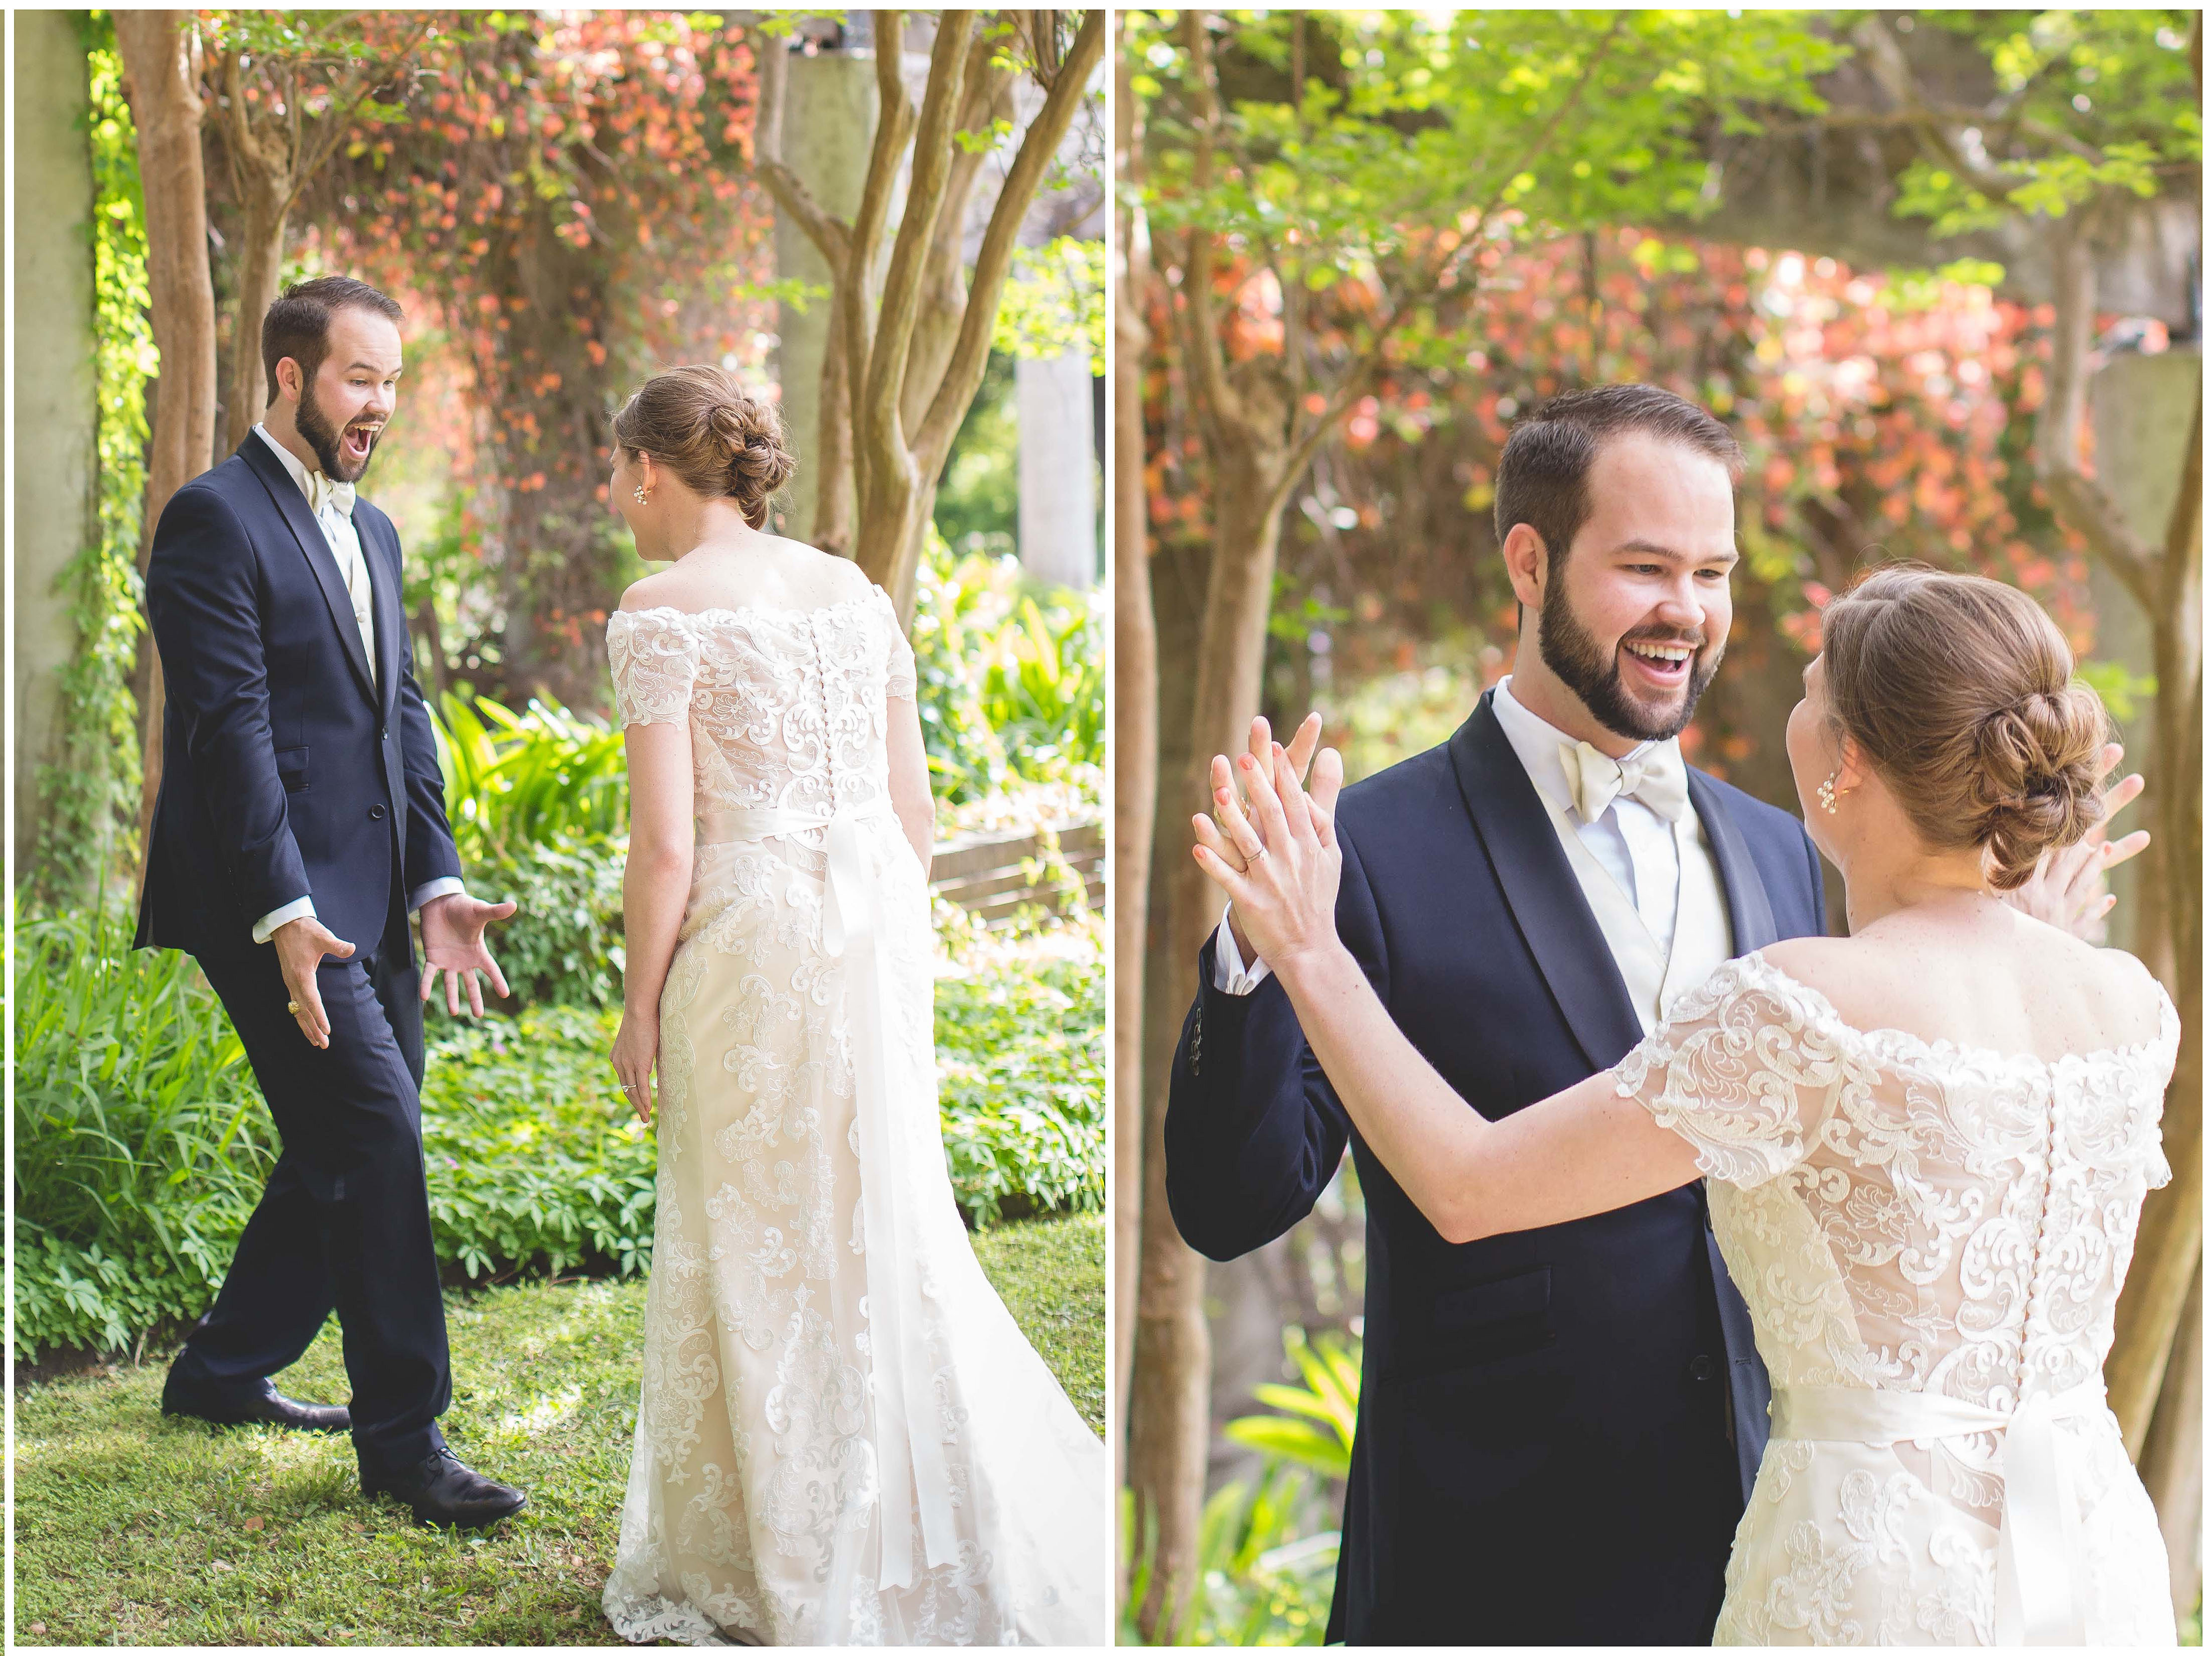 Фото невеста на свадьбе 17 фотография